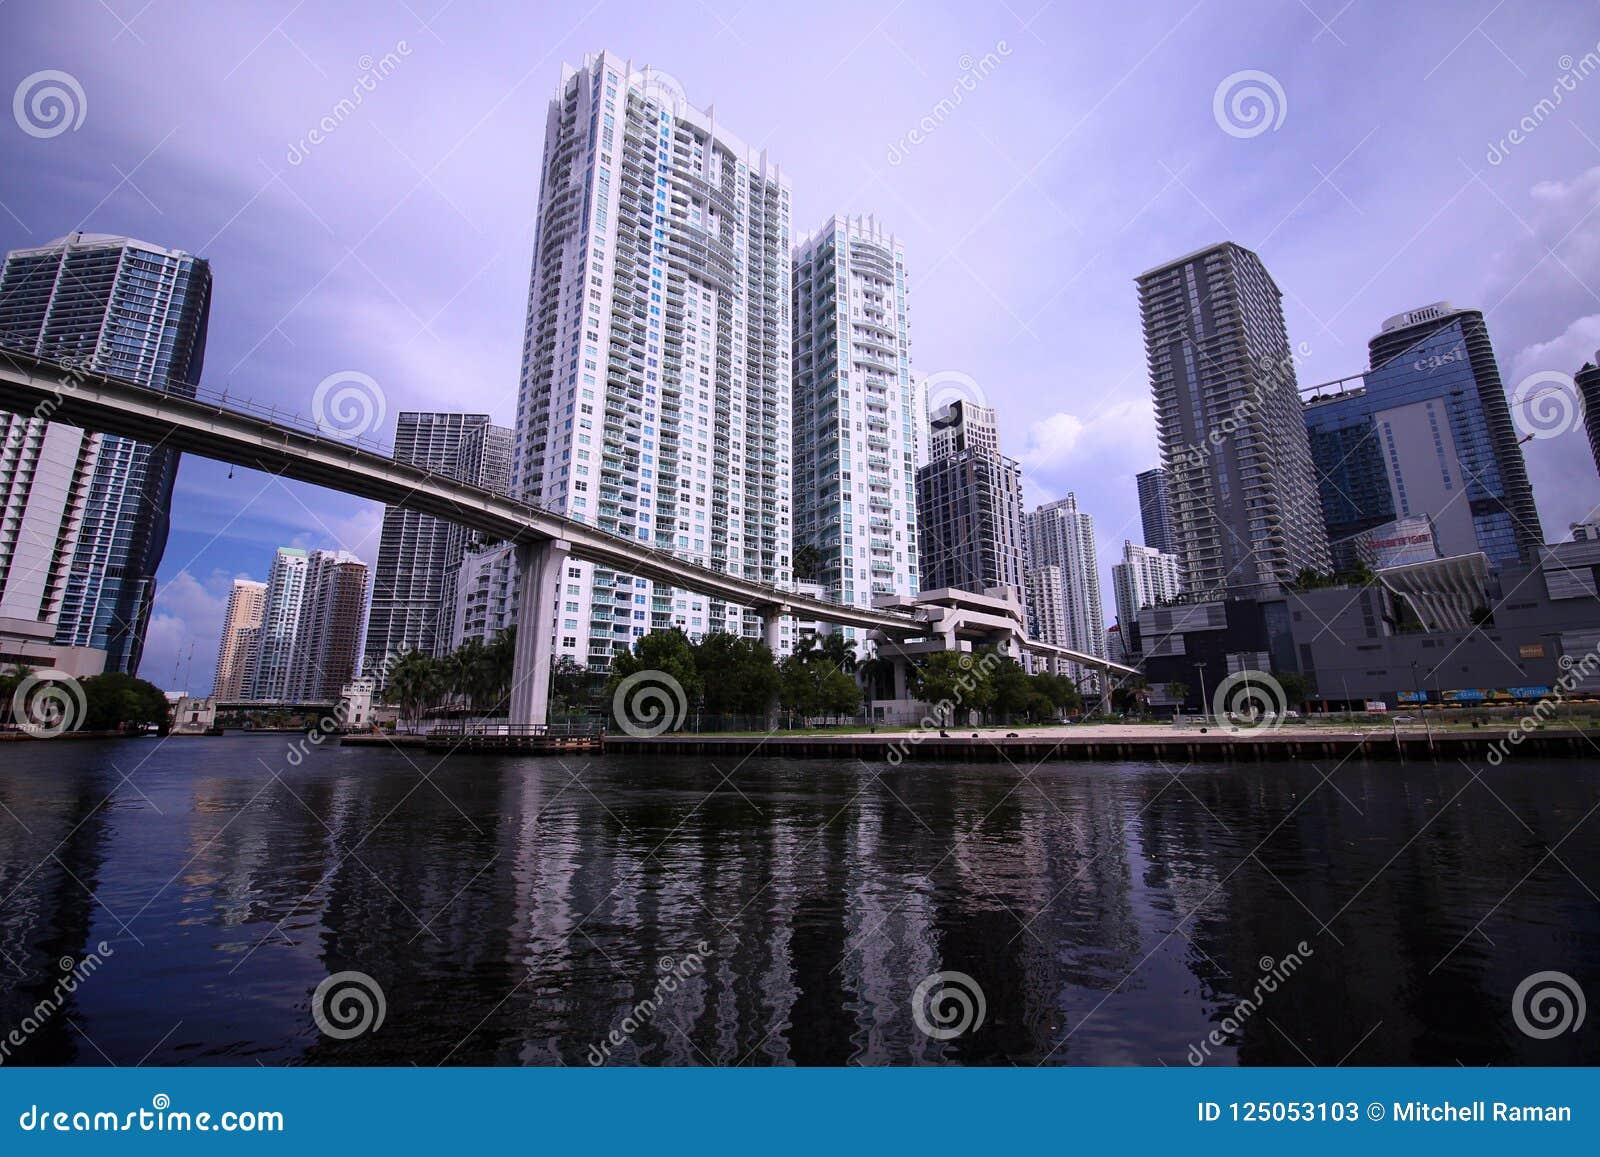 Skyline de Scape da cidade de Brickell Miami Florida do lado do rio